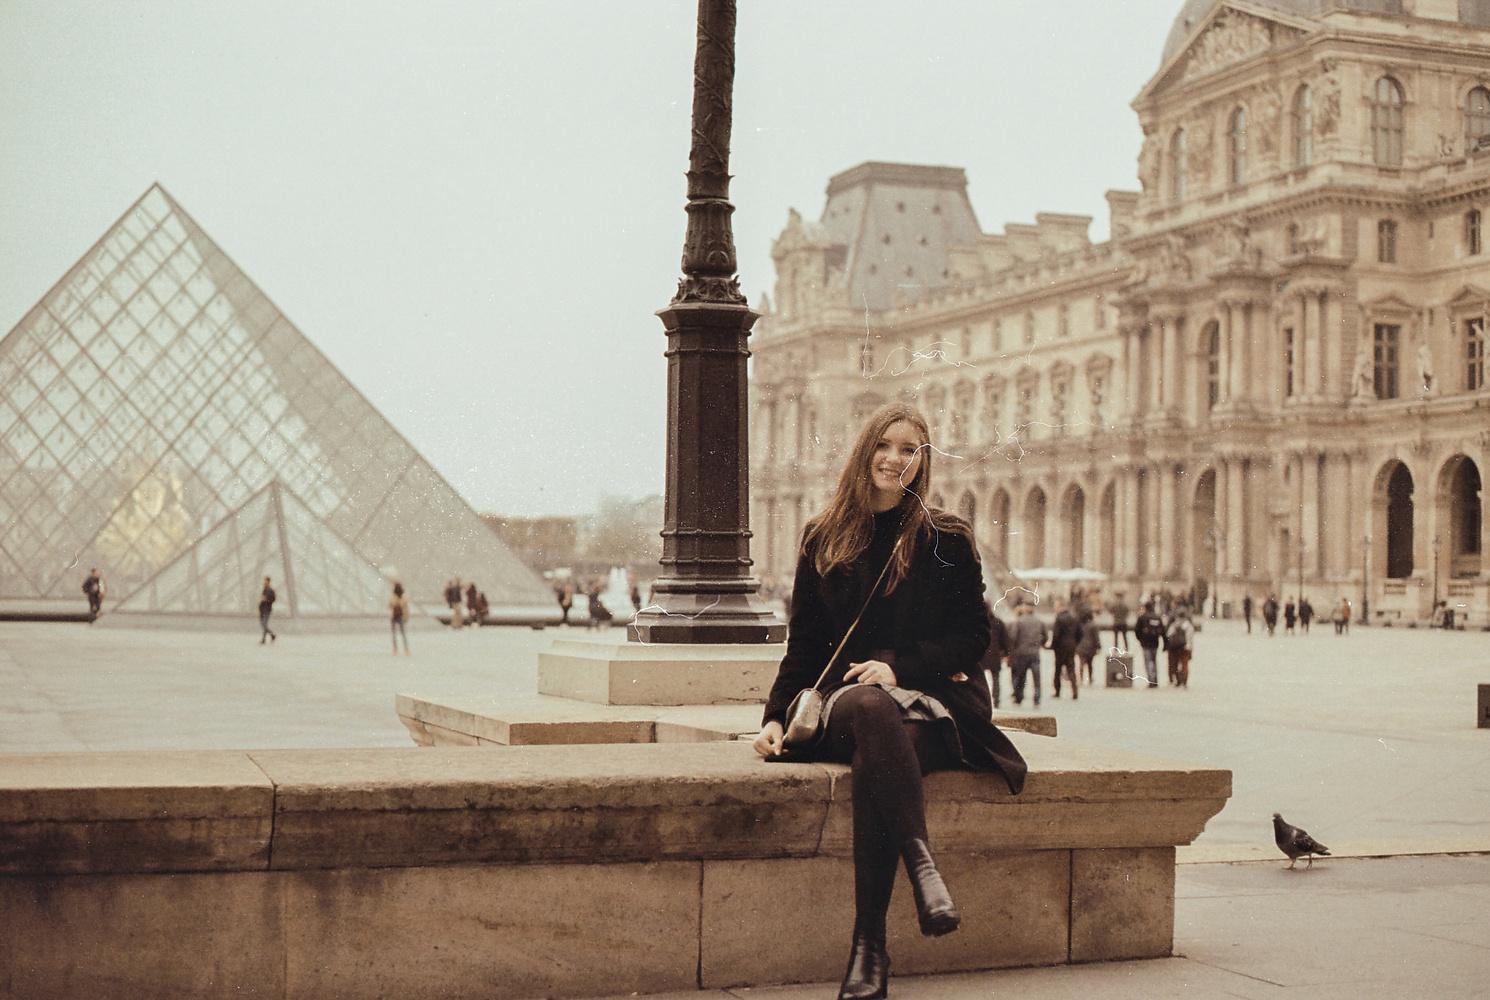 Eve Louvre by Joe Irving